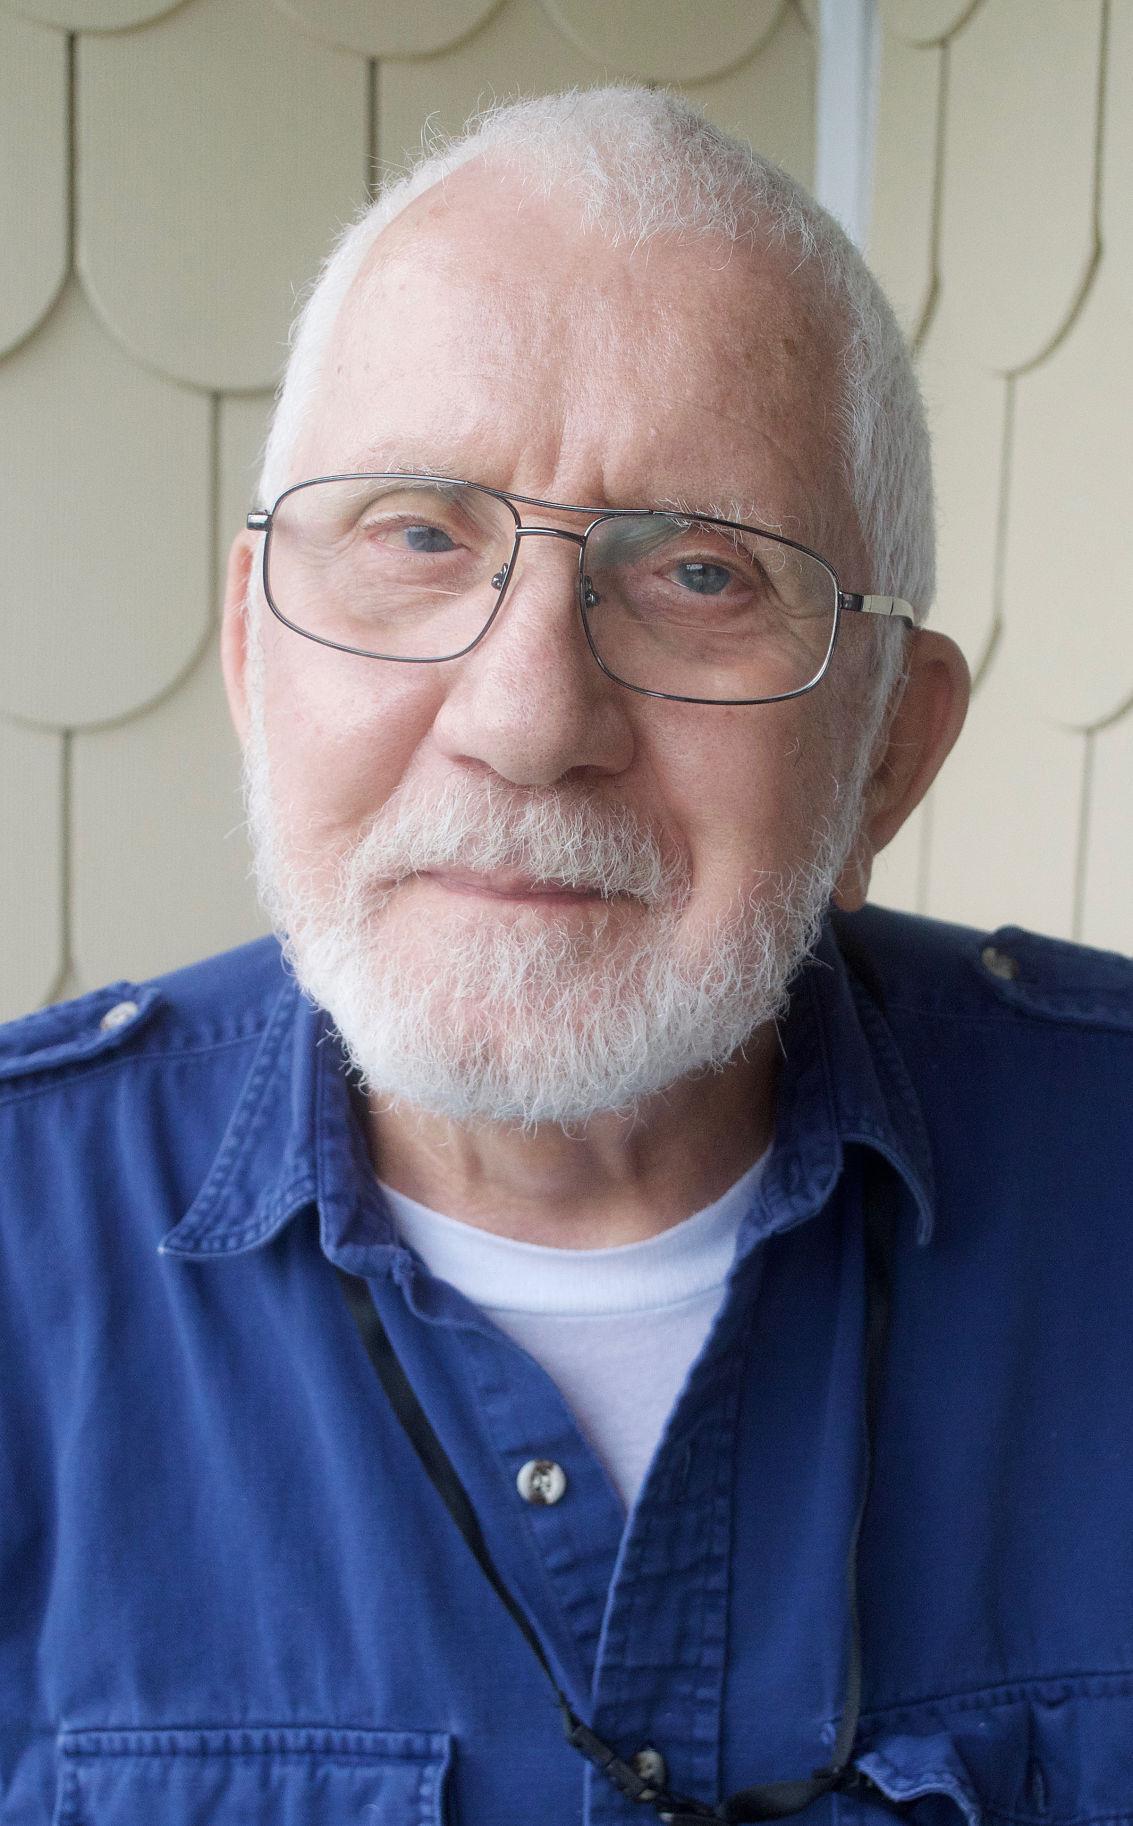 Thomas Schuerger